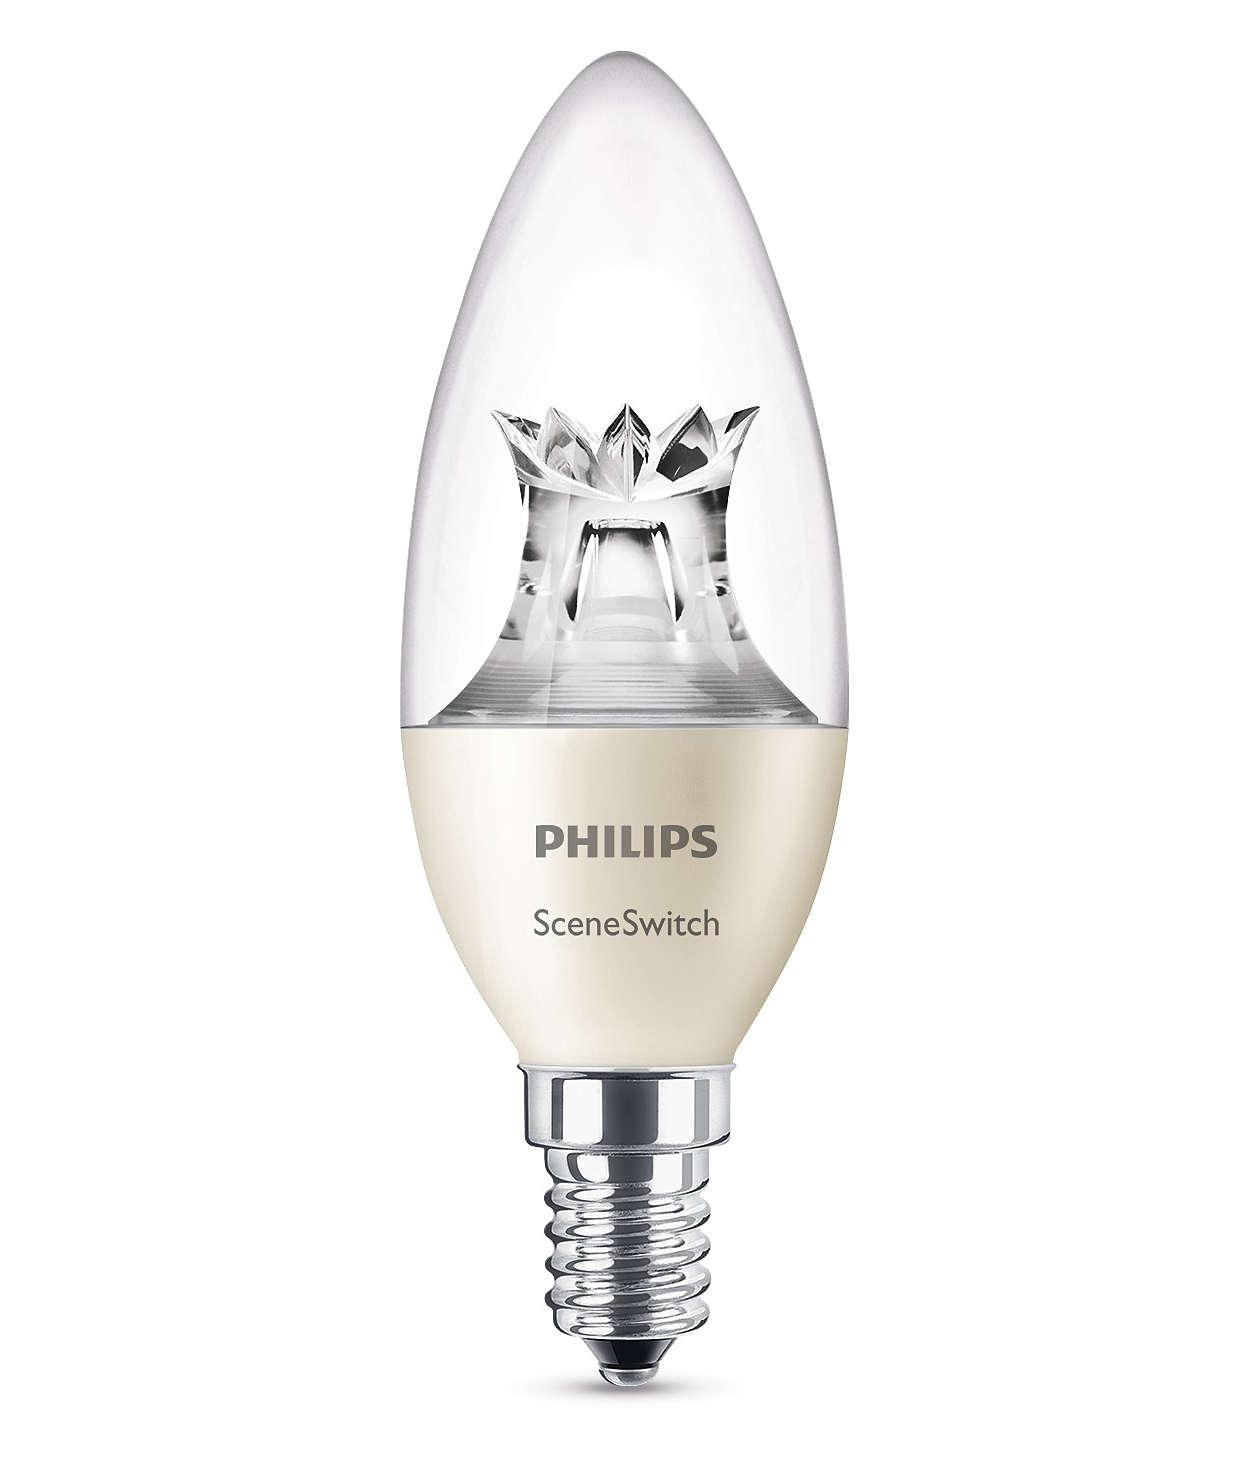 Una lampadina oliva, tre scenari luminosi